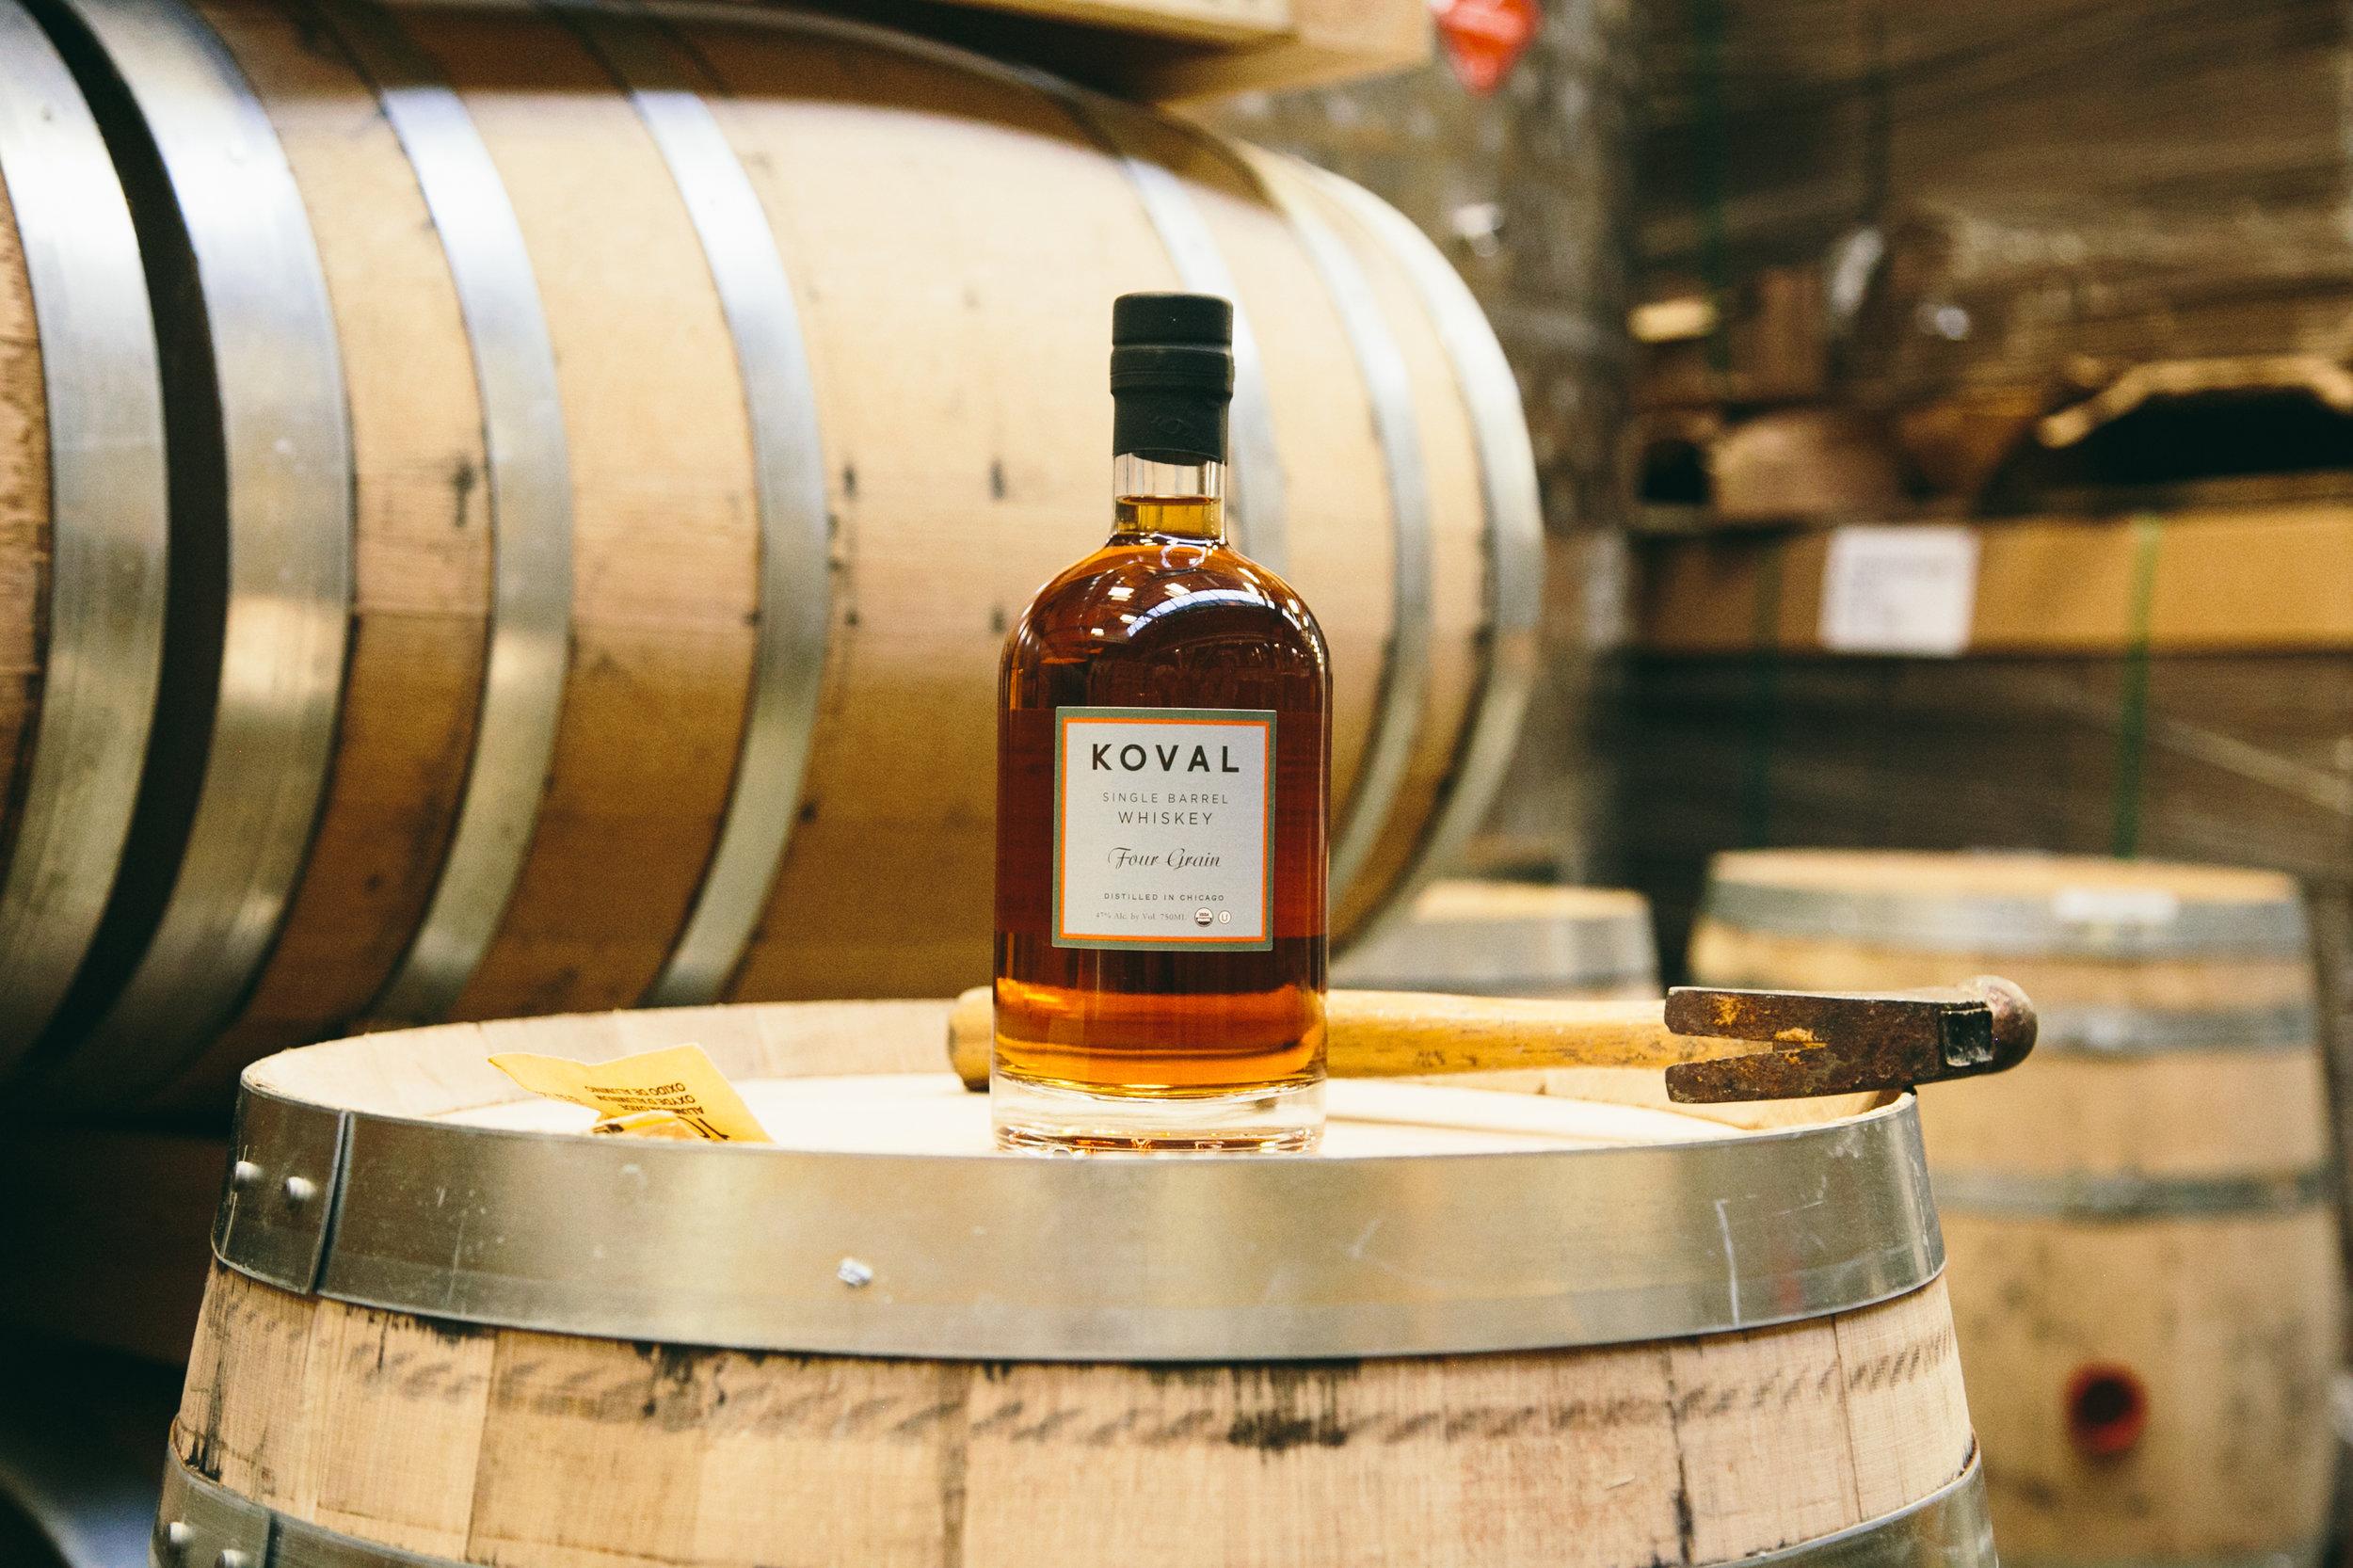 Koval_Four Grain